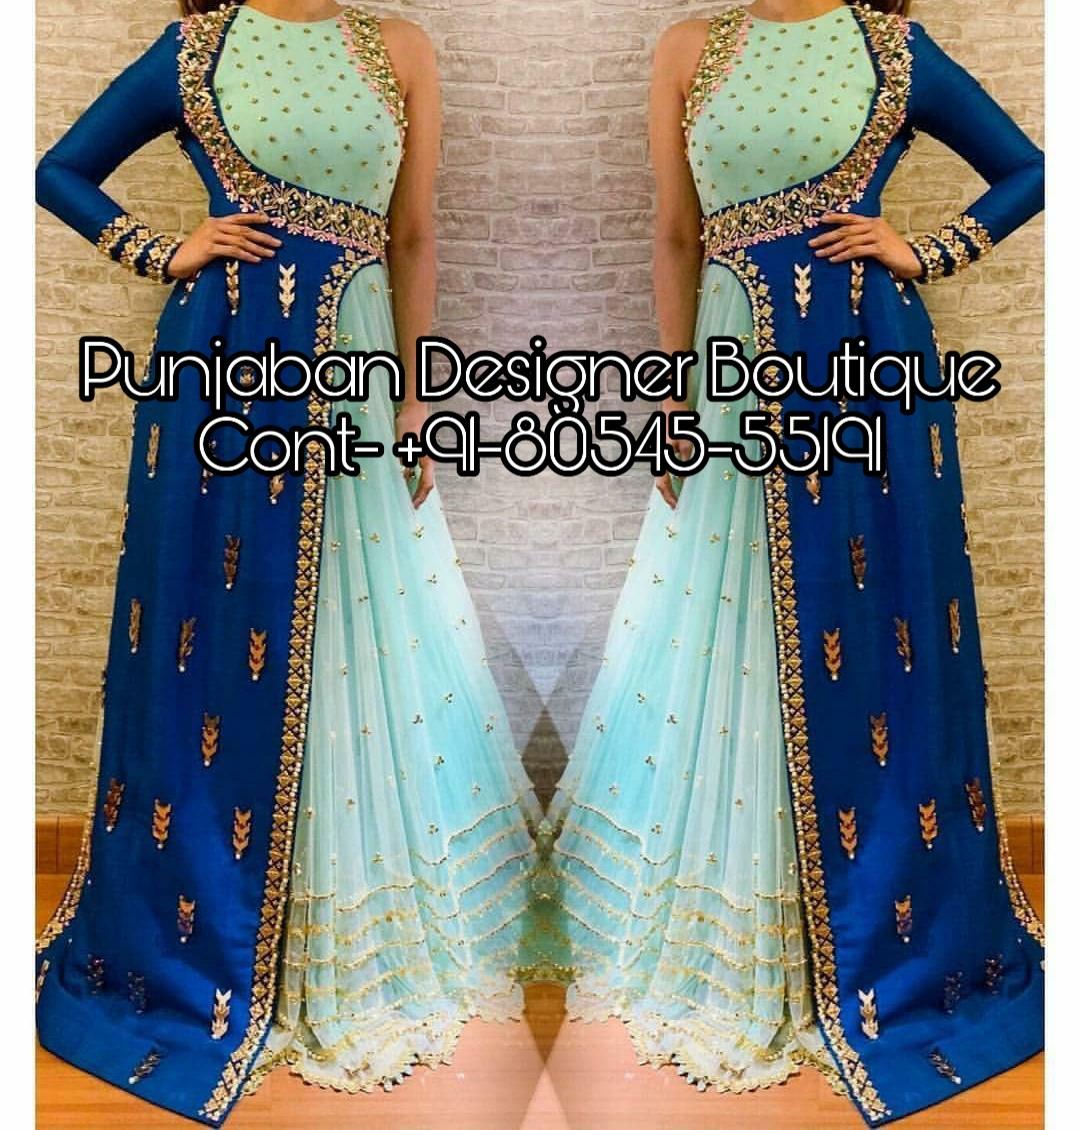 8088537b4a87a Western Dress Boutiques Mumbai | Punjaban Designer Boutique